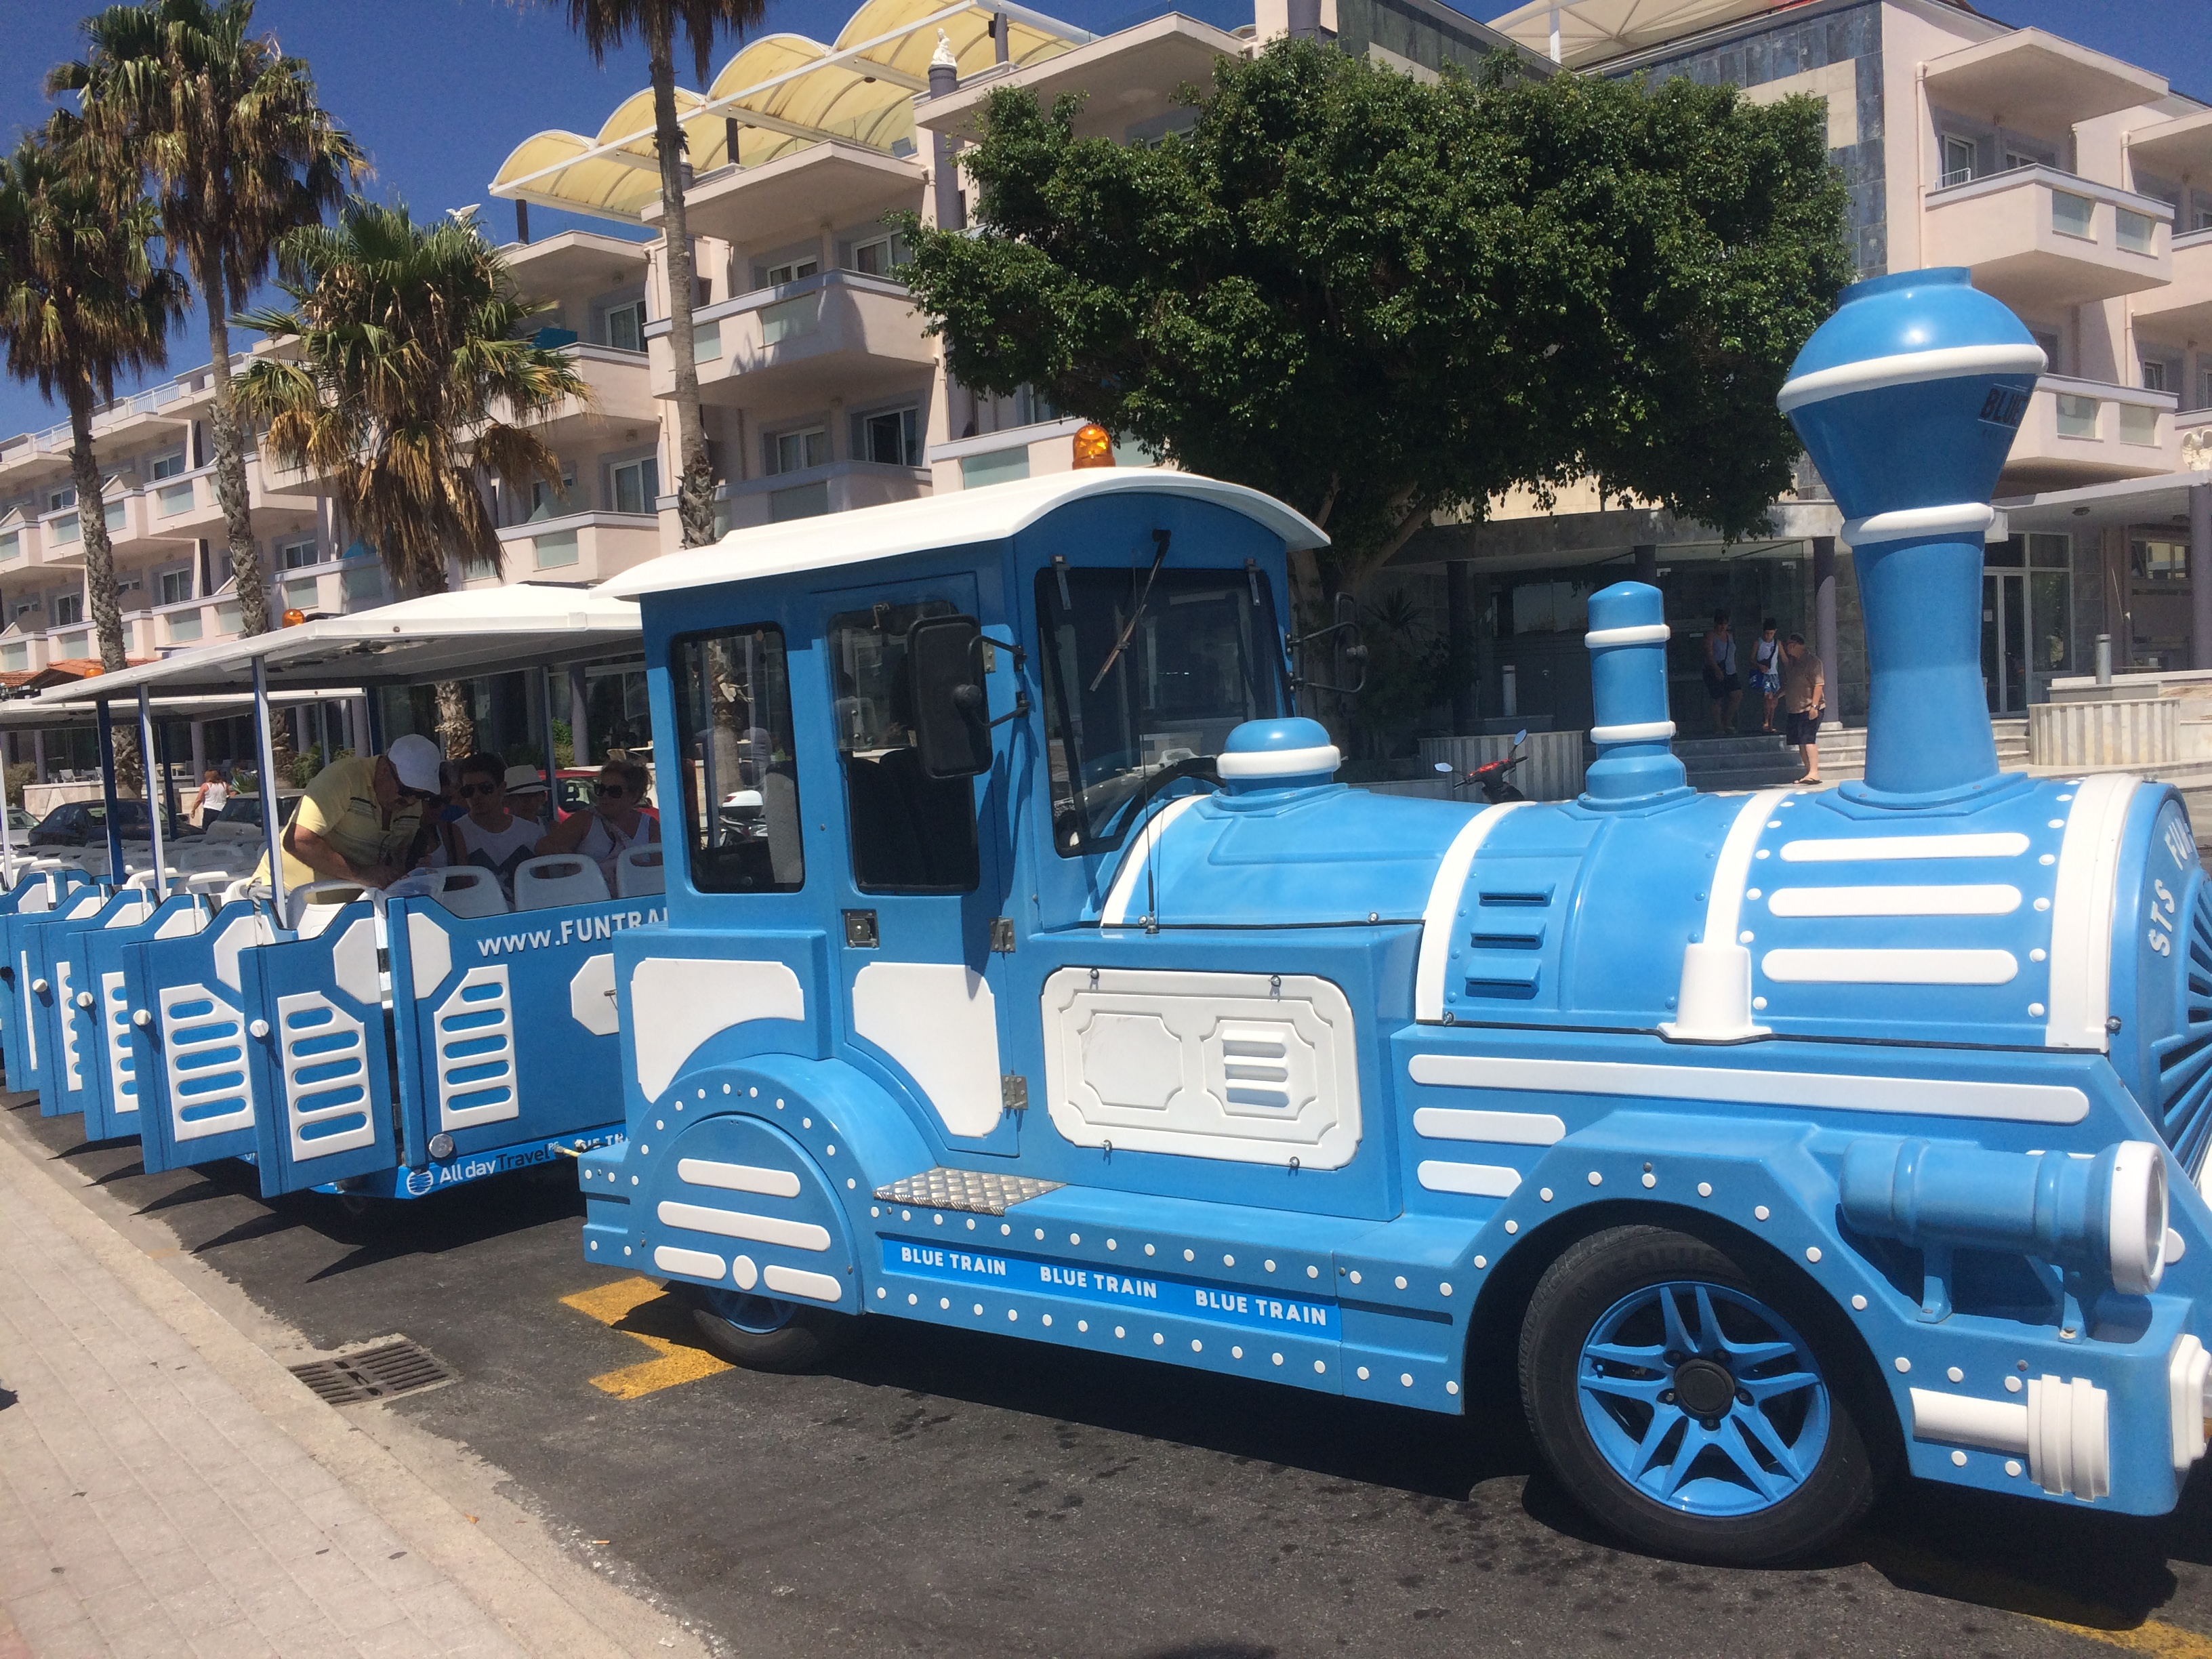 Blue Train - Kos Bodrum'un Karşısındaki Avrupa Kos Adası – İstanköy